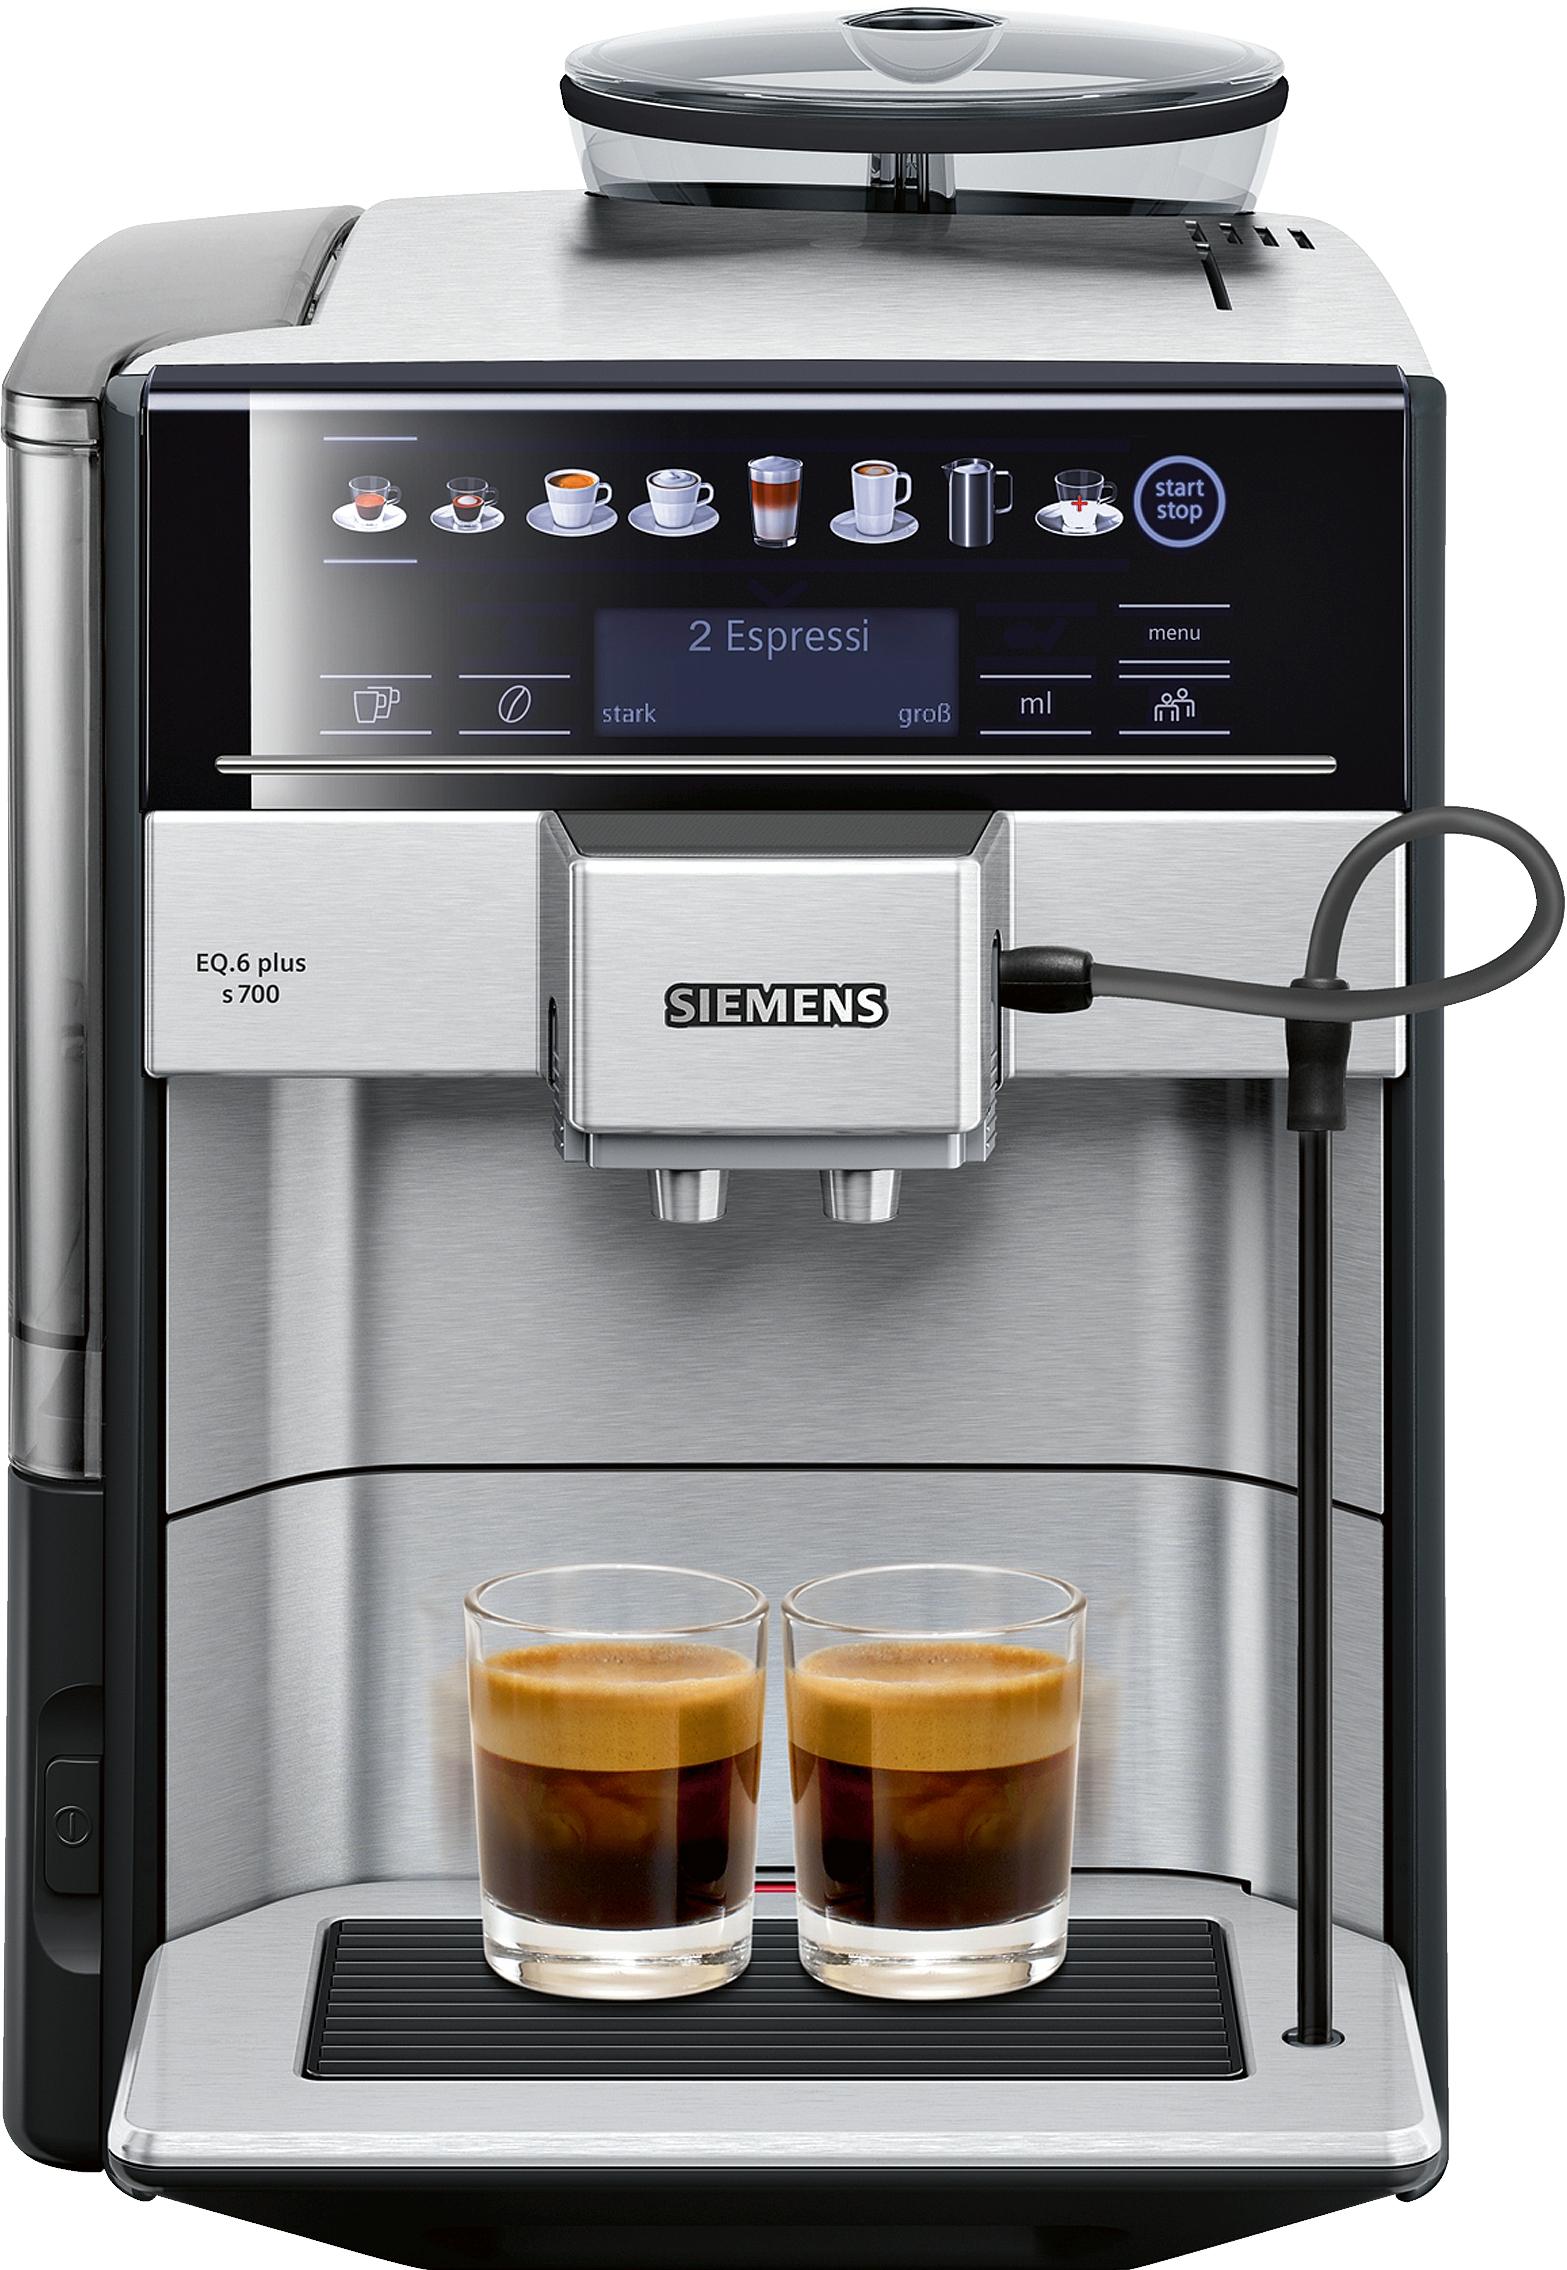 siemens te657503de kaffeevollautomat eq 6 plus s700 edelstahl espresso kaffee vollautomaten. Black Bedroom Furniture Sets. Home Design Ideas